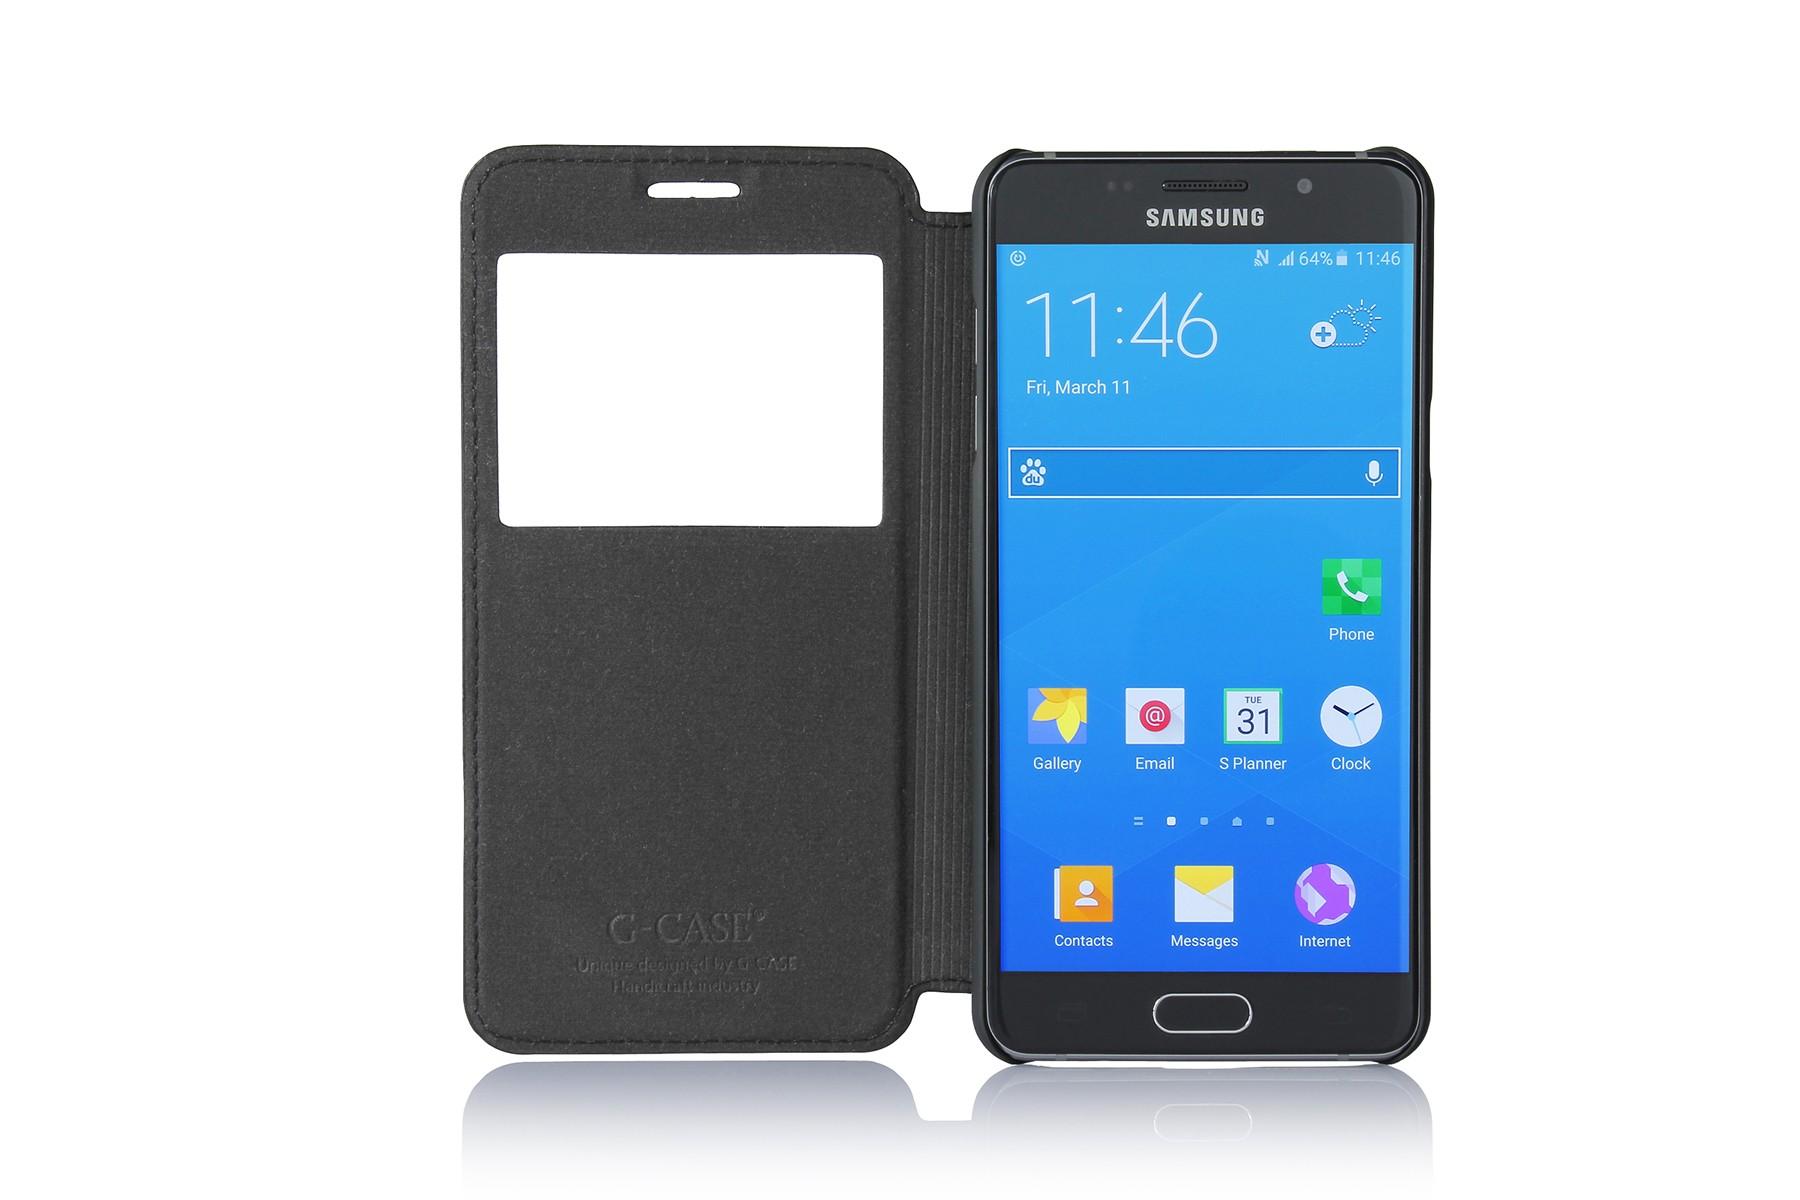 �����-������ G-case Slim Premium ��� Samsung Galaxy A5 (2016) black GG-677